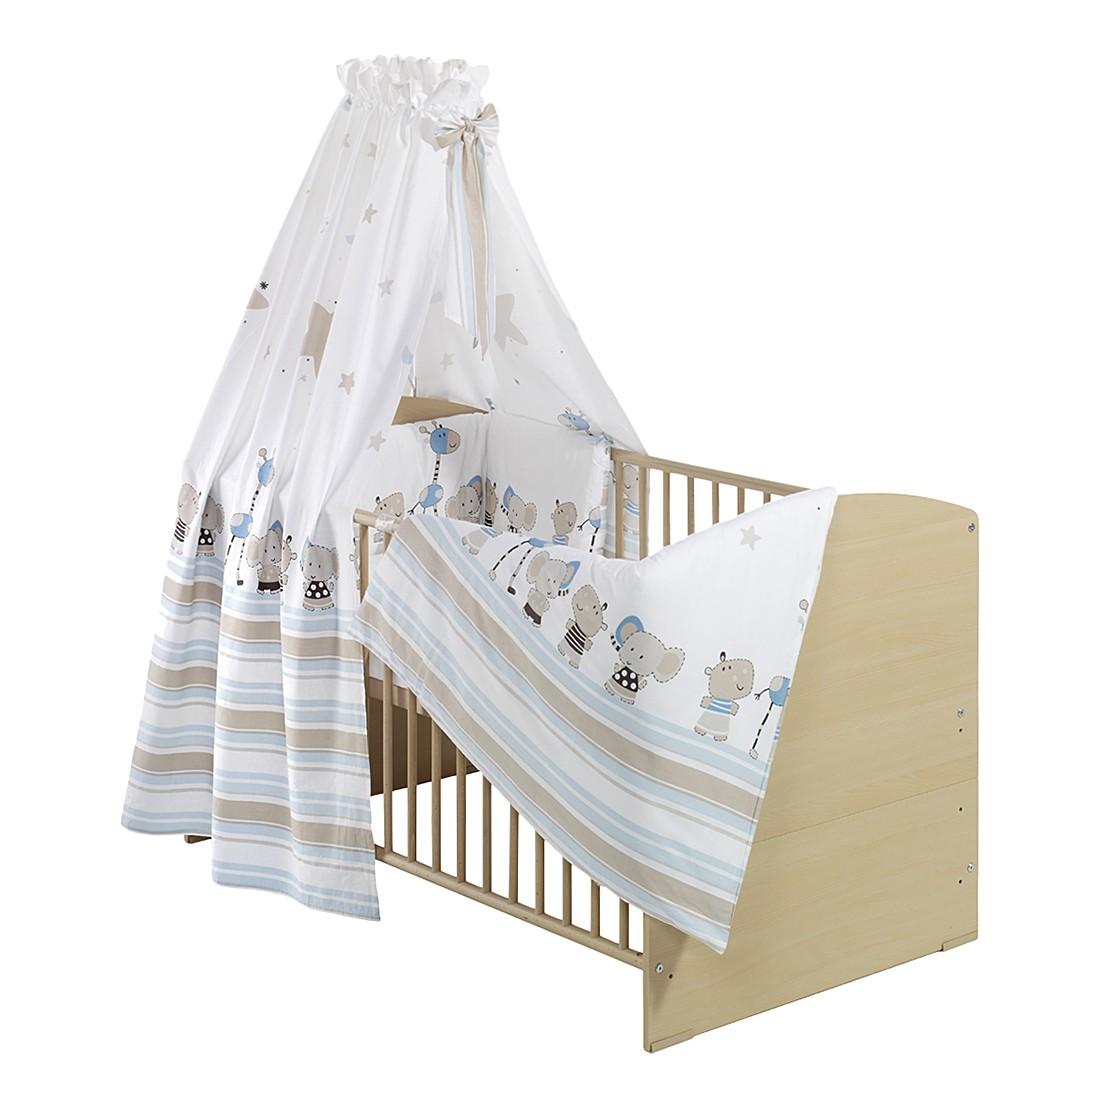 Komplettbett CLASSIC LINE (inkl. Matratze & Textil-Set) – Buche massiv – lackiert – Textil: Braun gepunktet, Schardt günstig bestellen